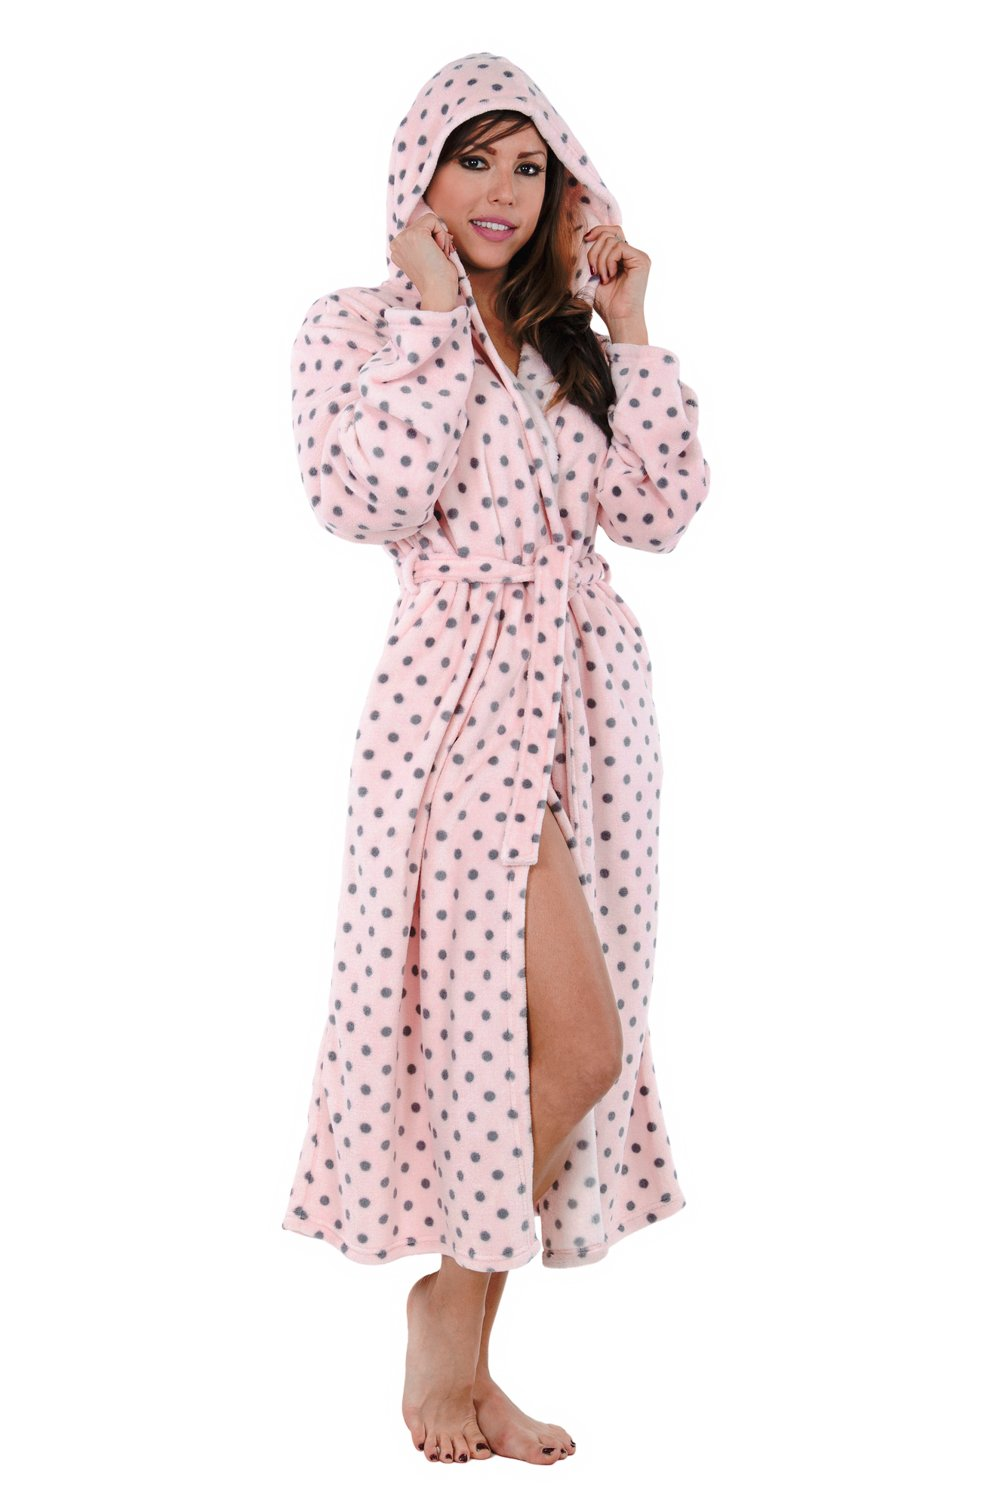 Hoodie Robe Hooded Robe Spa Bathrobe Hoody Robe Long Robe … (Large, Pink Polka Dot) by Love This Robe (Image #6)